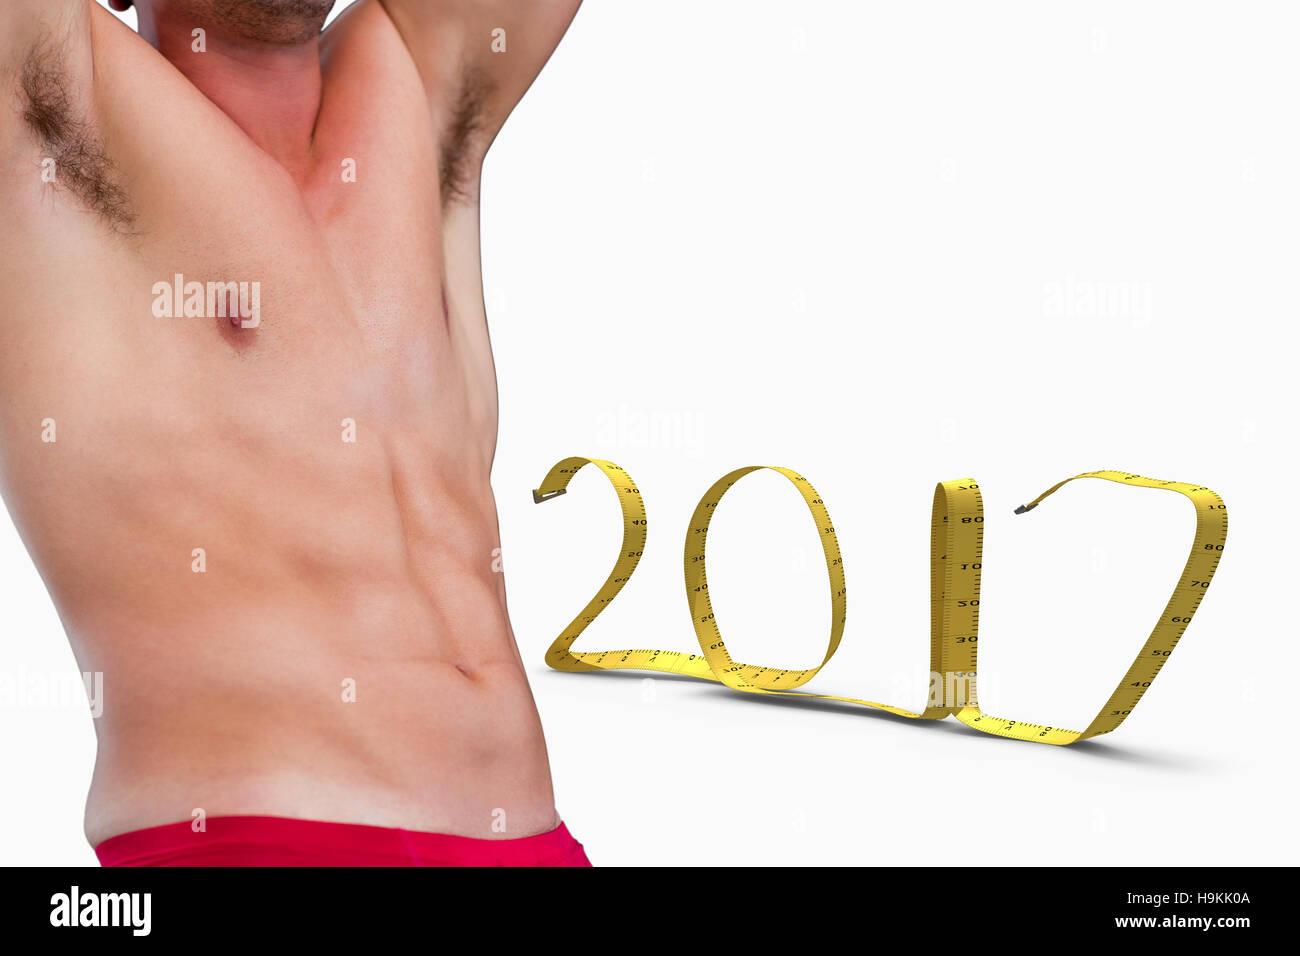 Composite image of bodybuilder - Stock Image